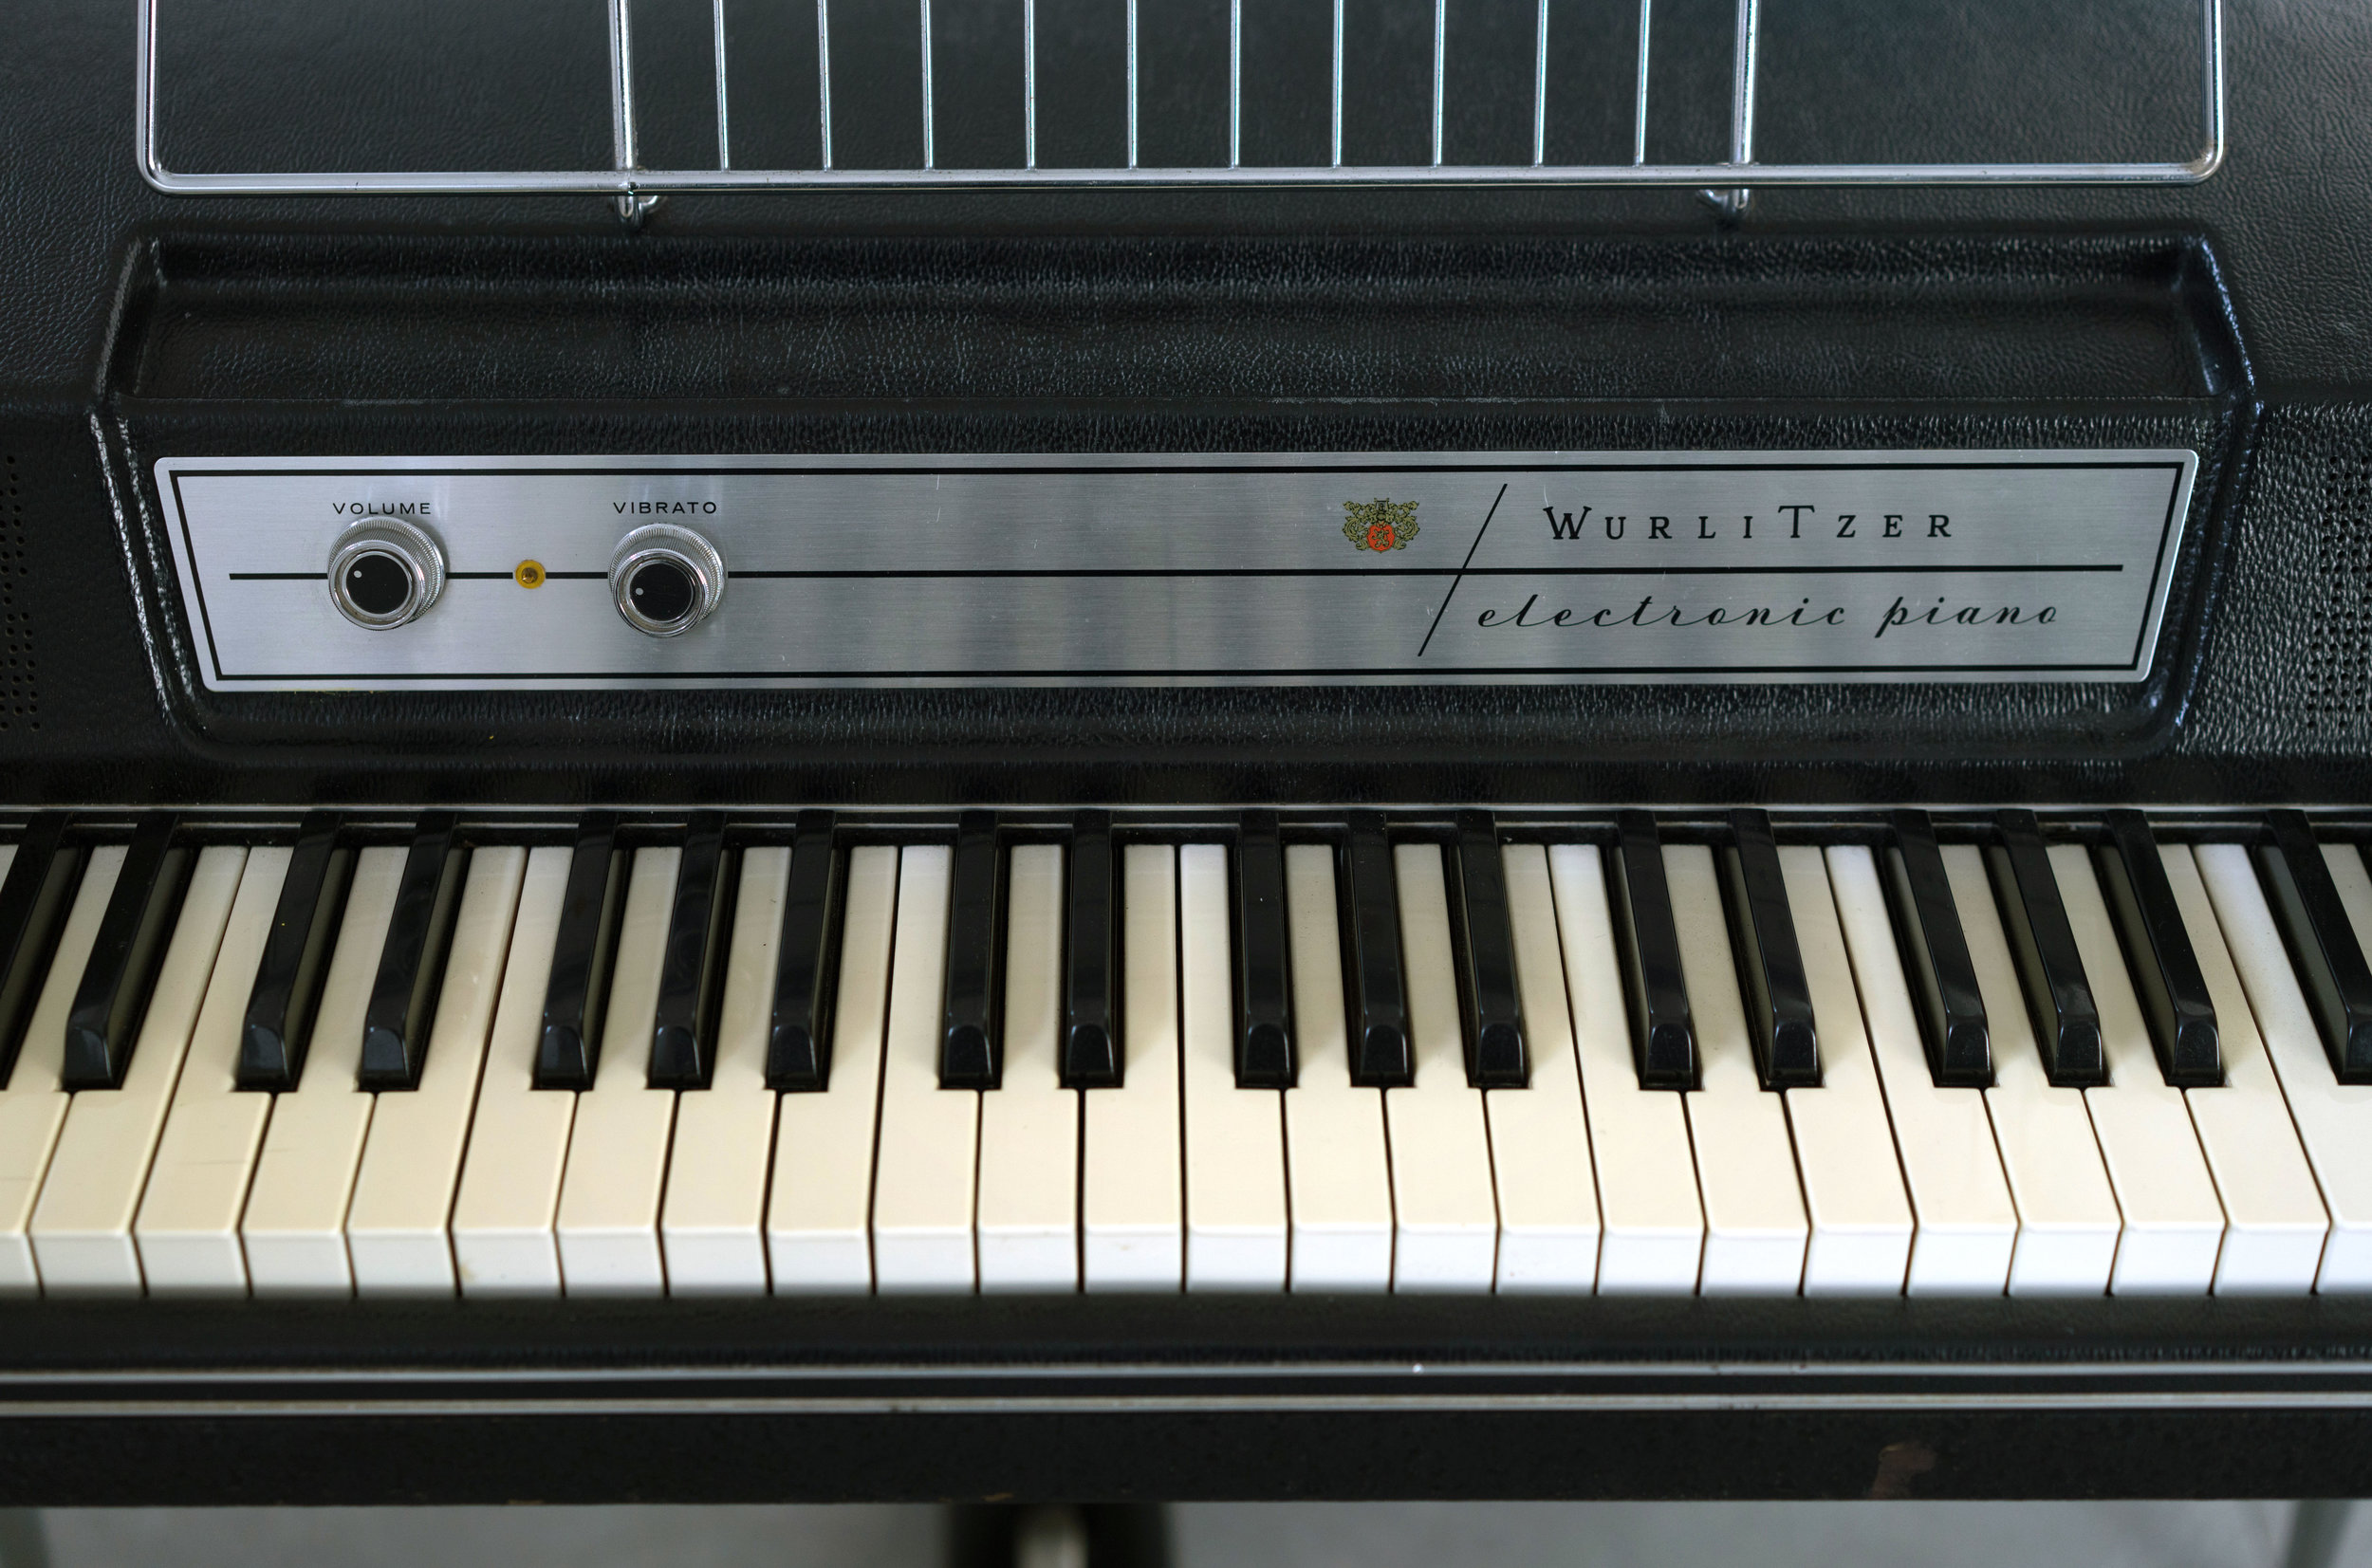 A late-model Wurlitzer 200.